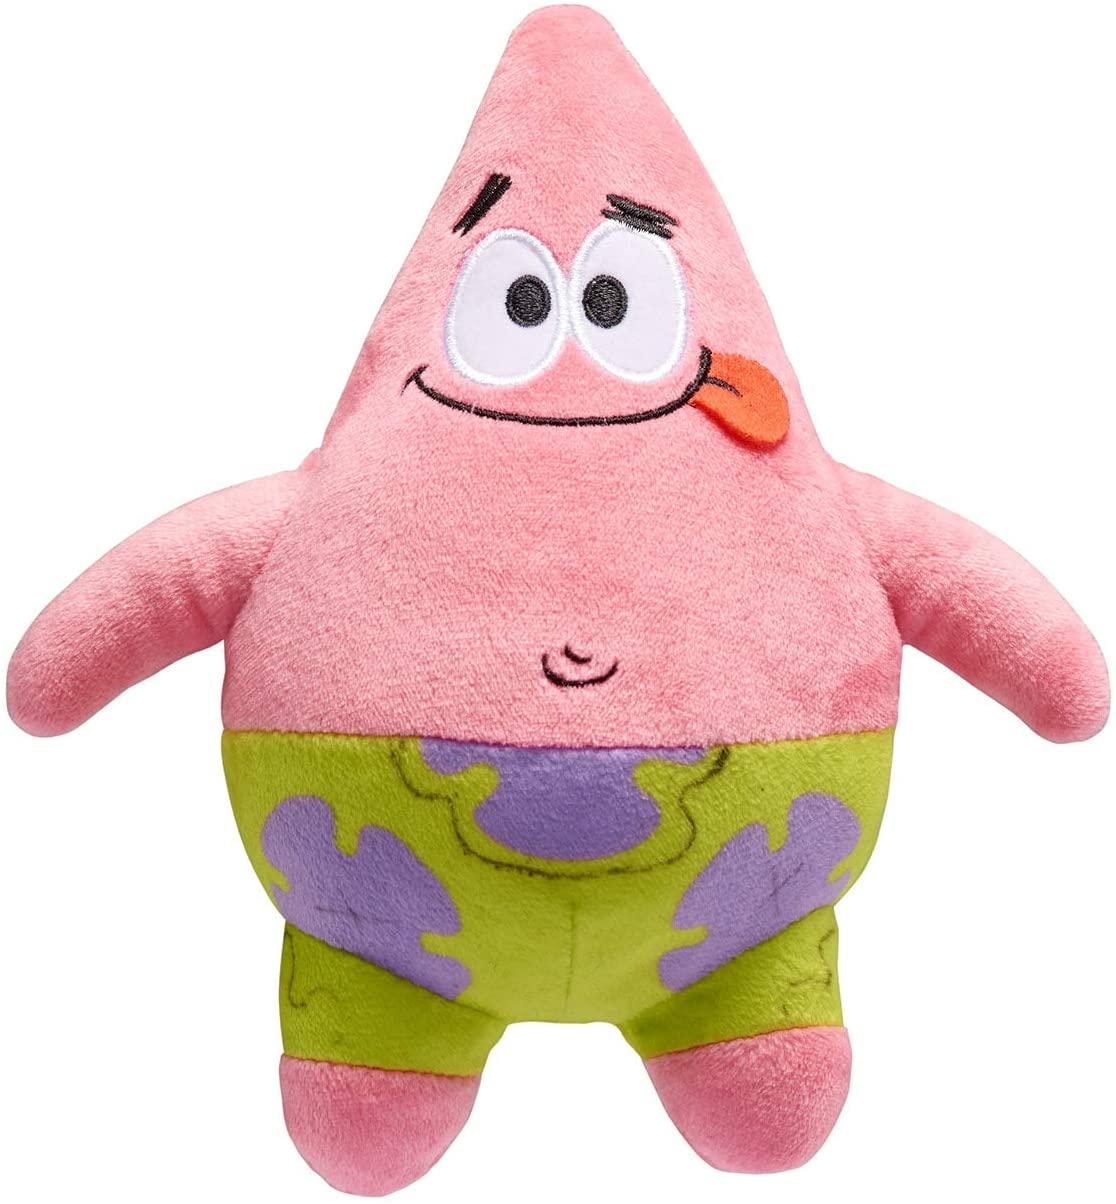 SpongeBob SquarePants Officially Licensed Mini Plush - 6 Patrick